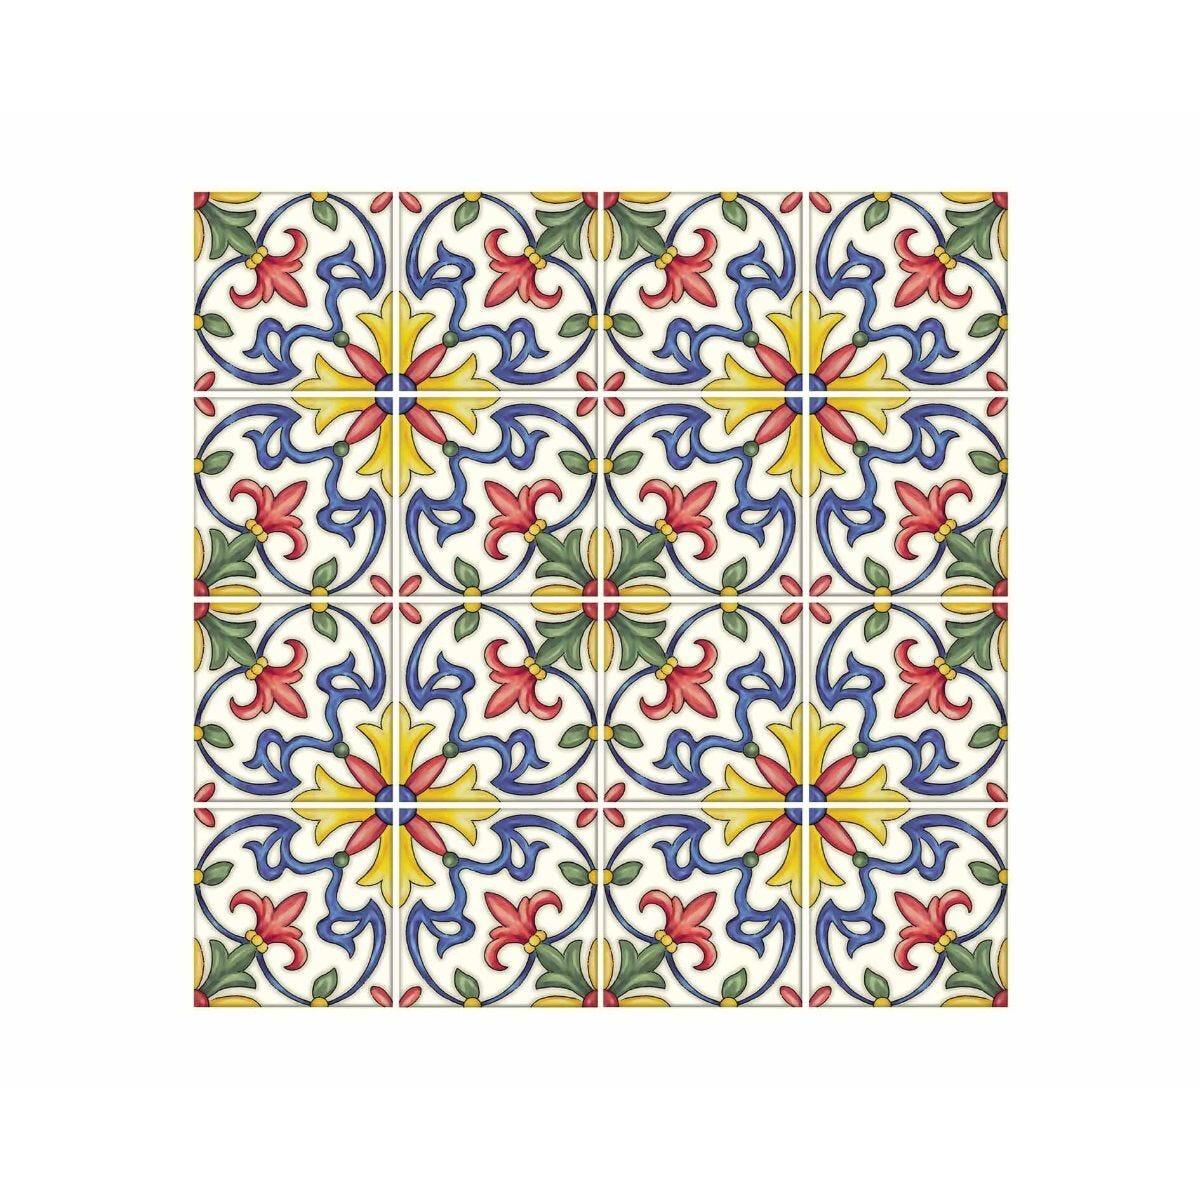 Tuscan Floral Backsplash Tiles Wall Decor